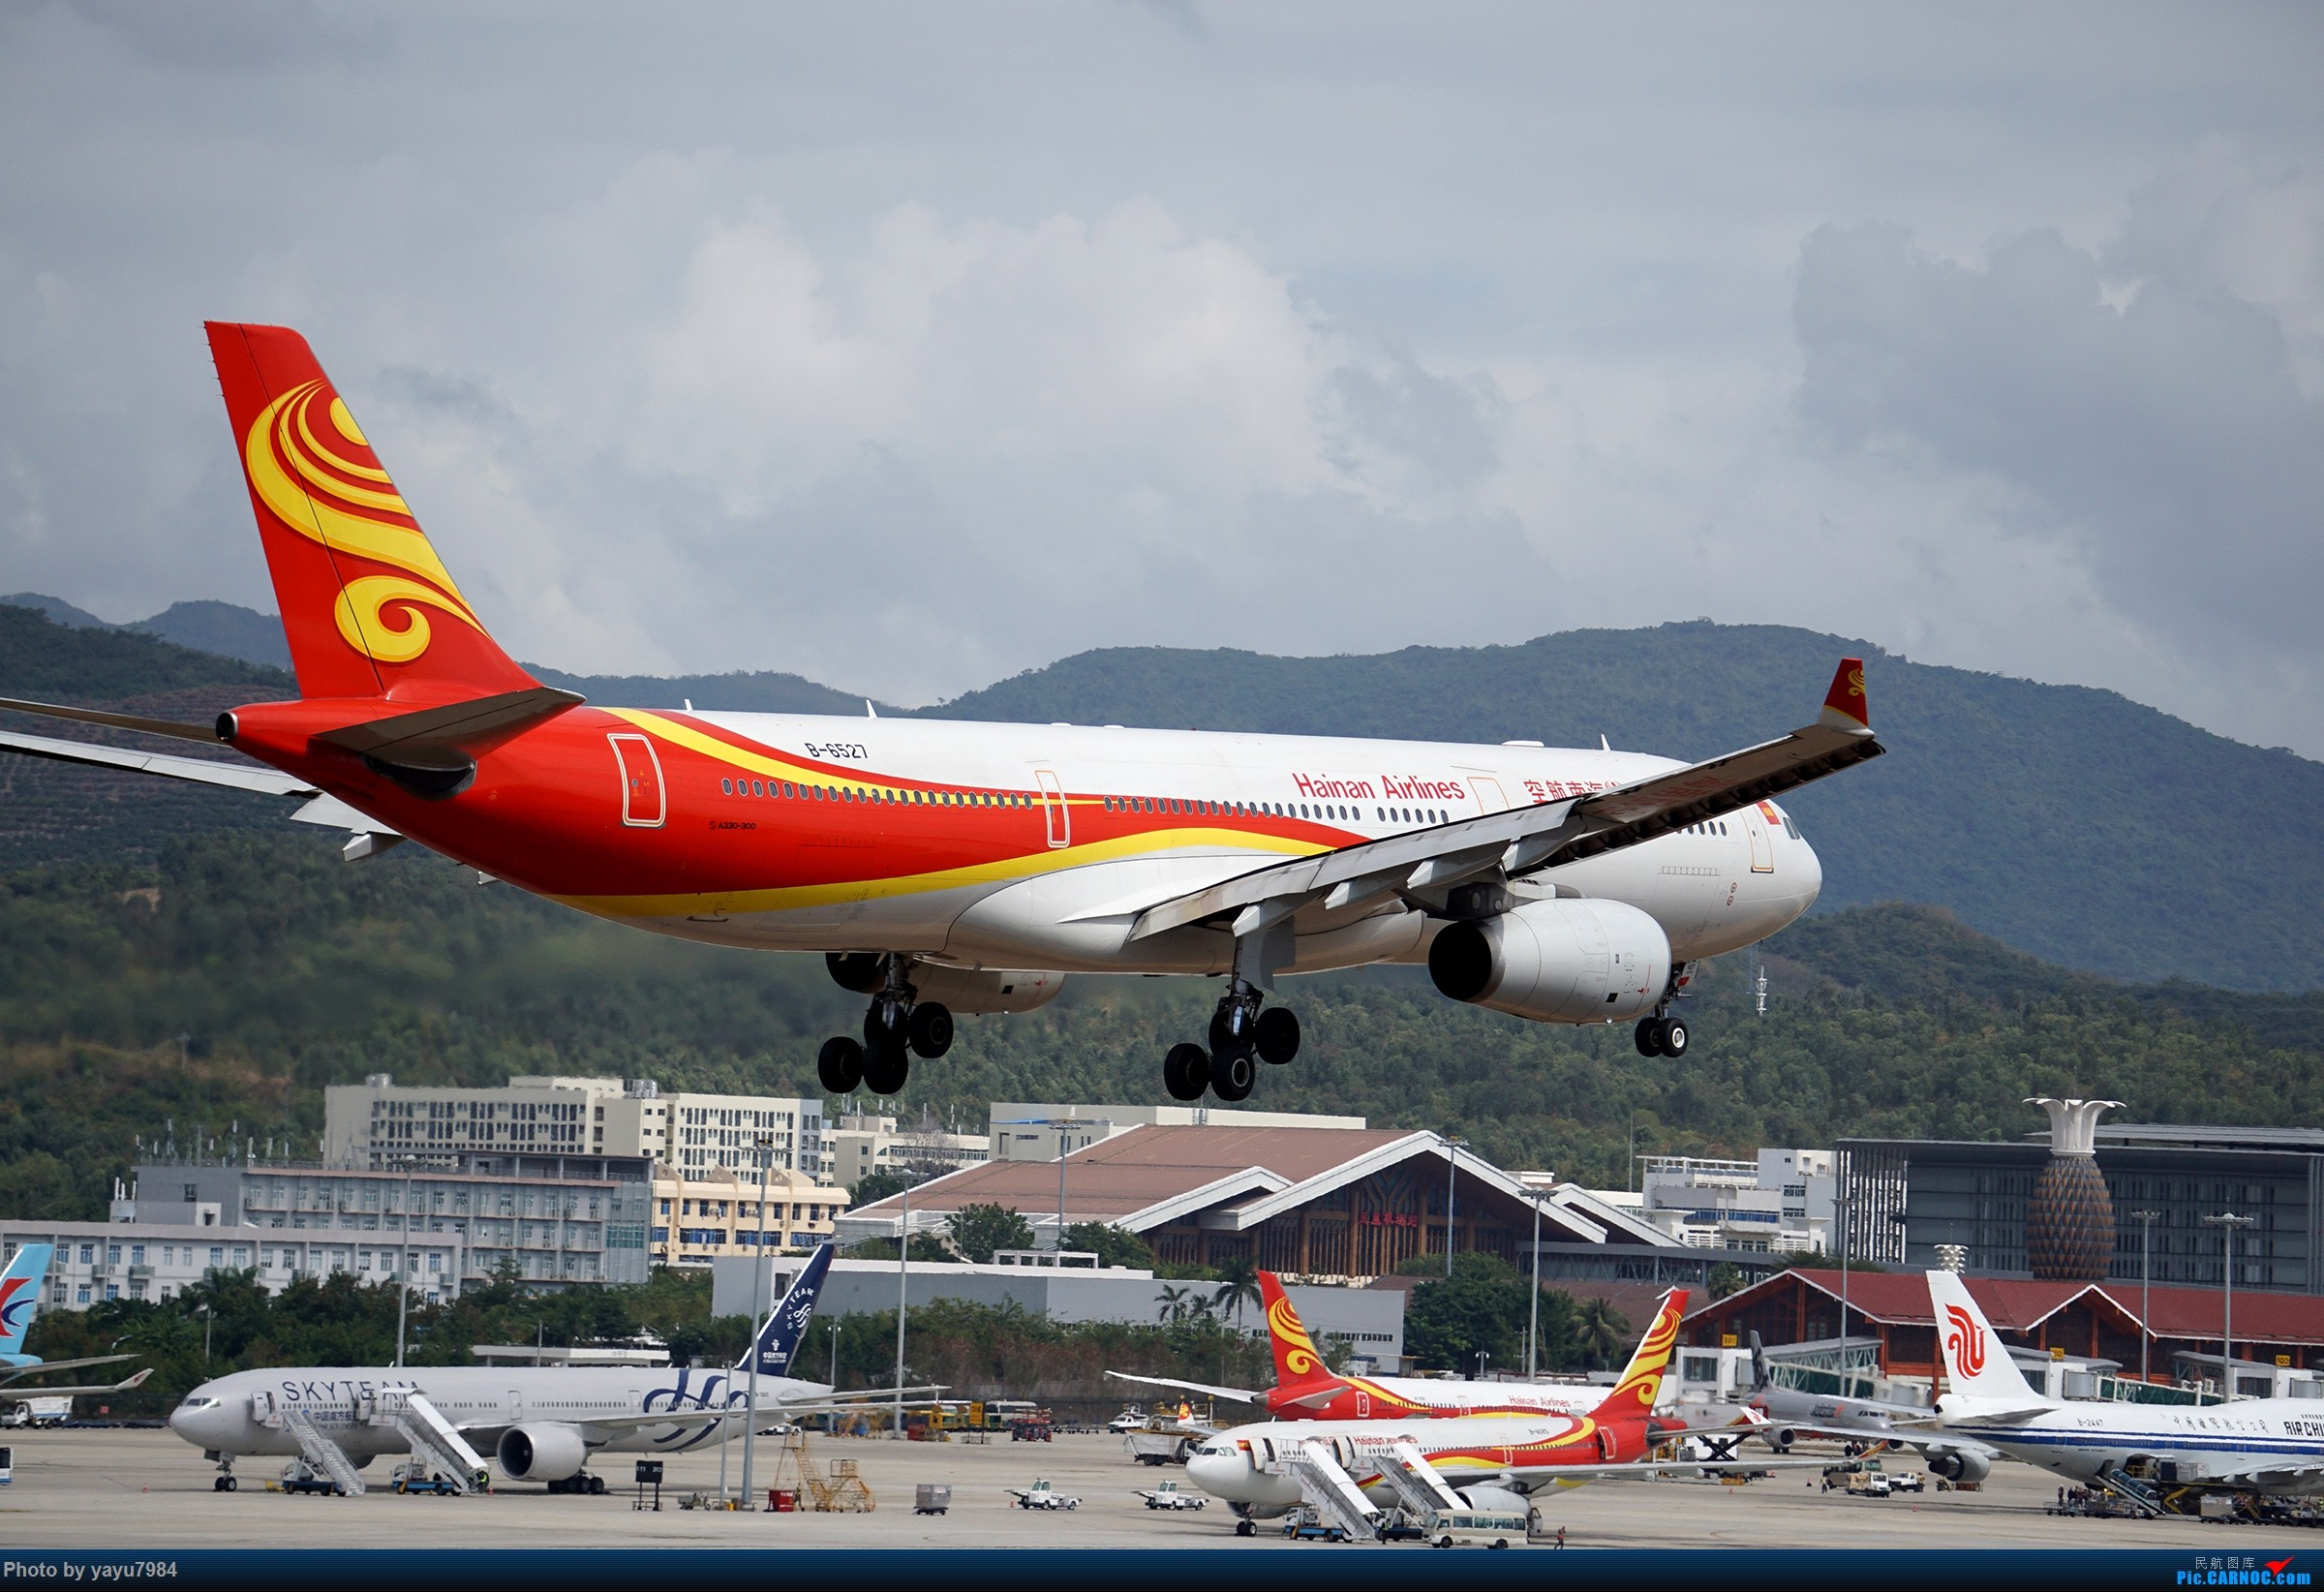 Re:[原创][SYX] 回国首拍,春运高峰时段的三亚凤凰国际机场 AIRBUS A330-300 B-6527 中国三亚凤凰国际机场